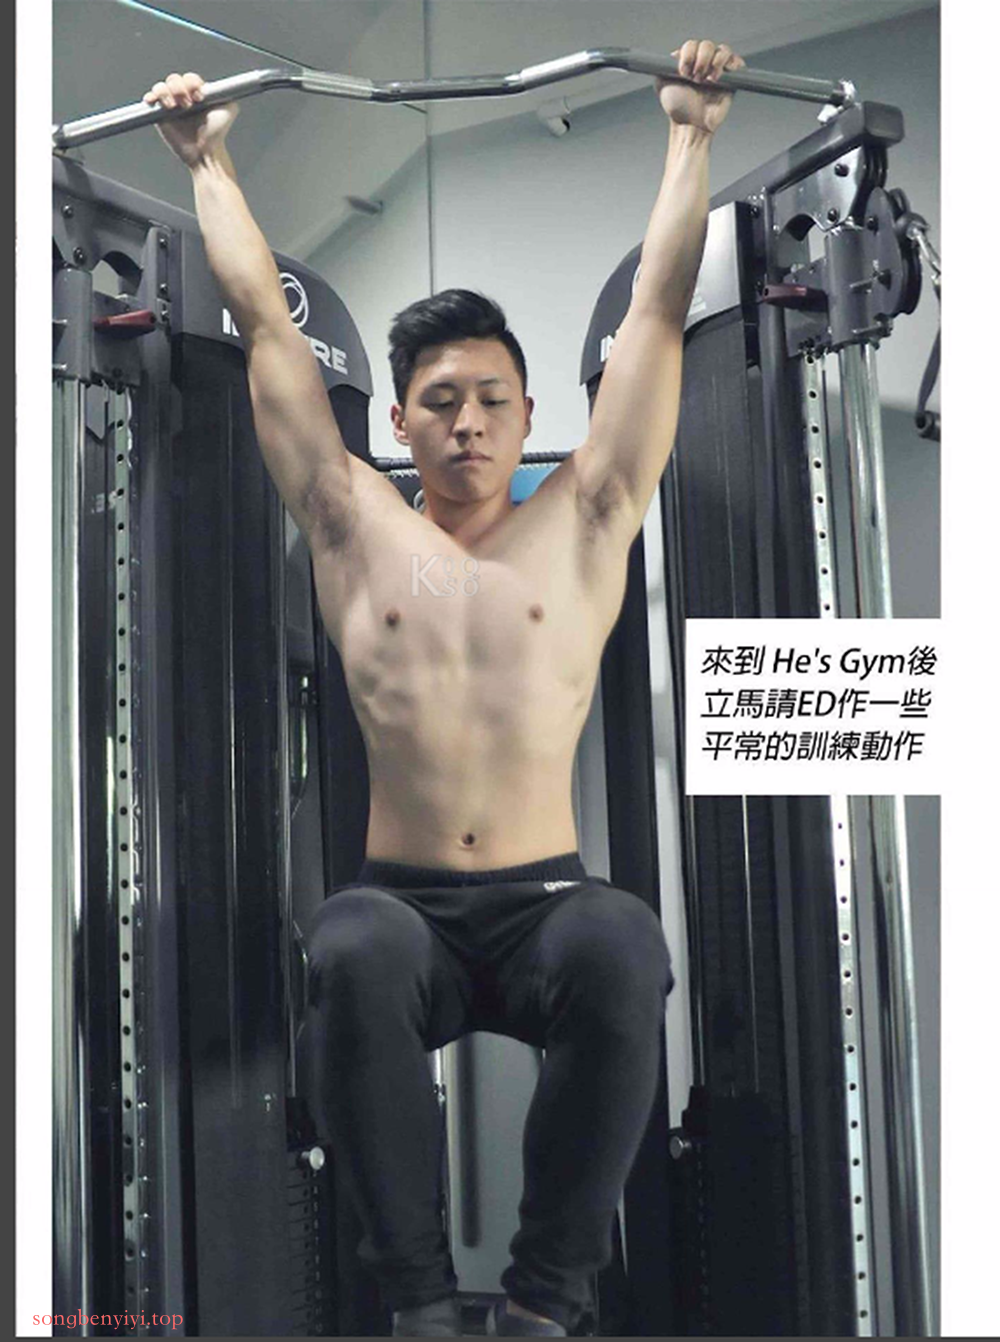 BE A MODEL 10高雄健身教練 躍身成為寫真男模 ED-13.png